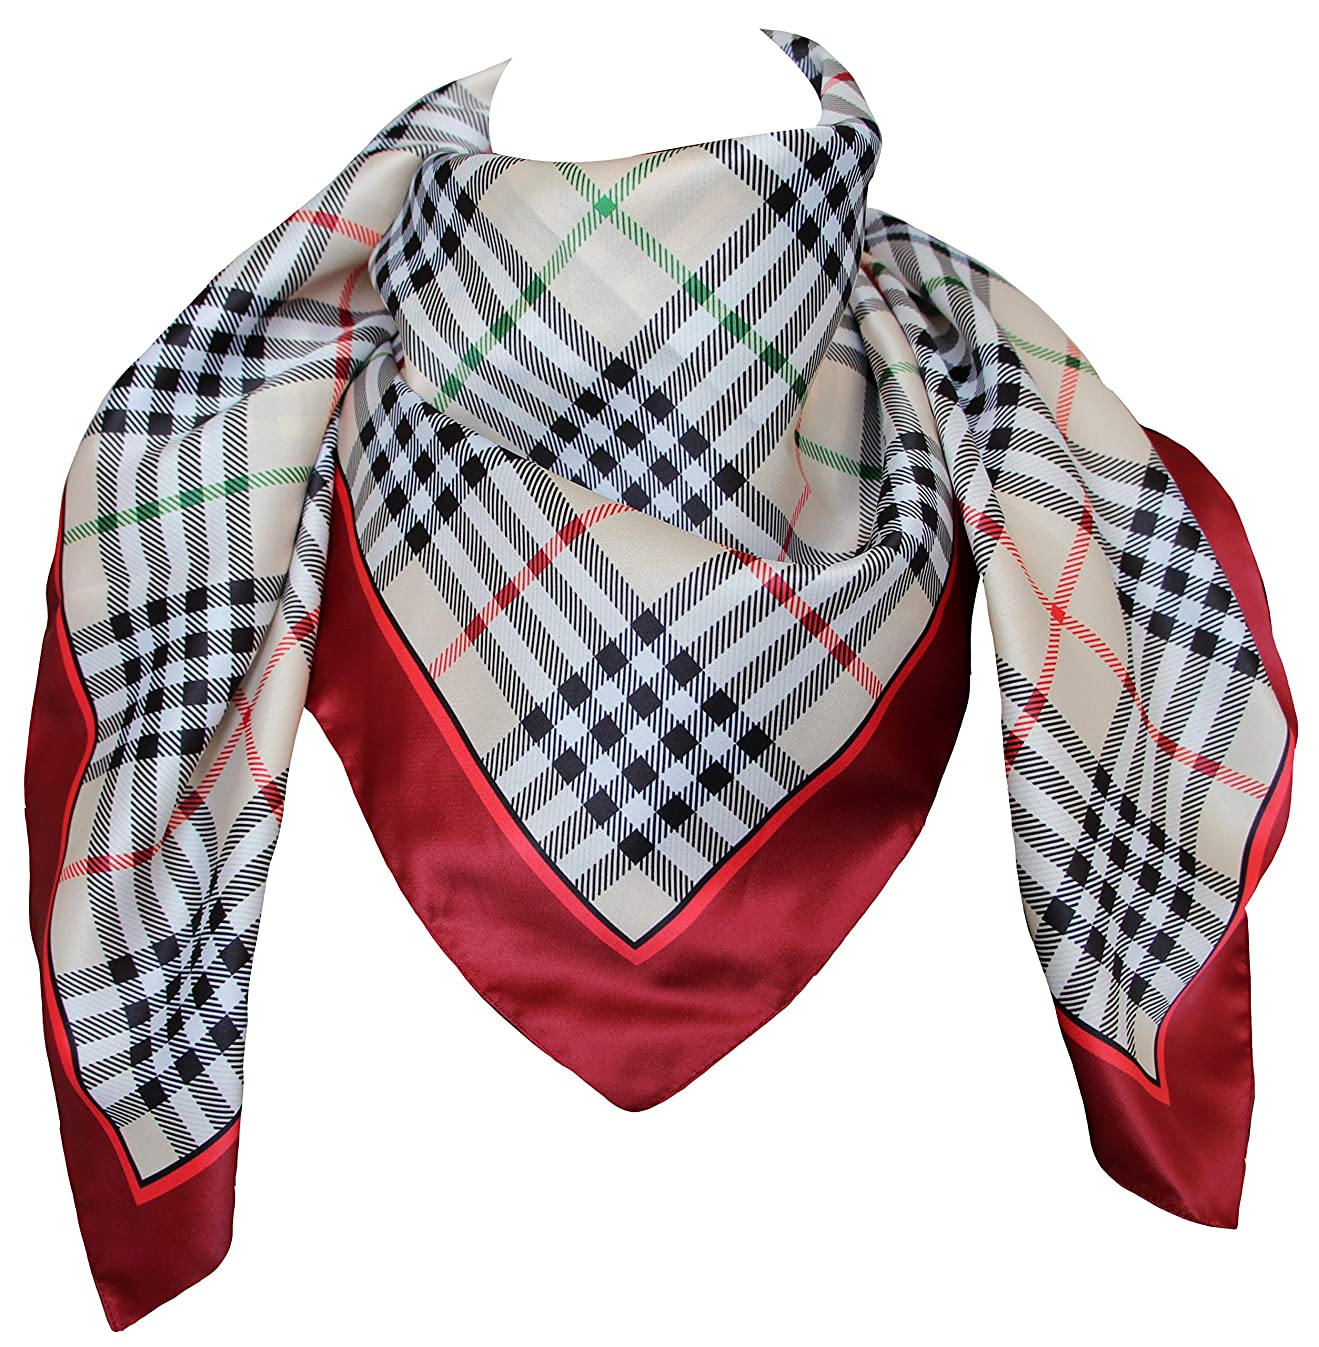 foulard dis 62689 var 4 size inch 36 x 36